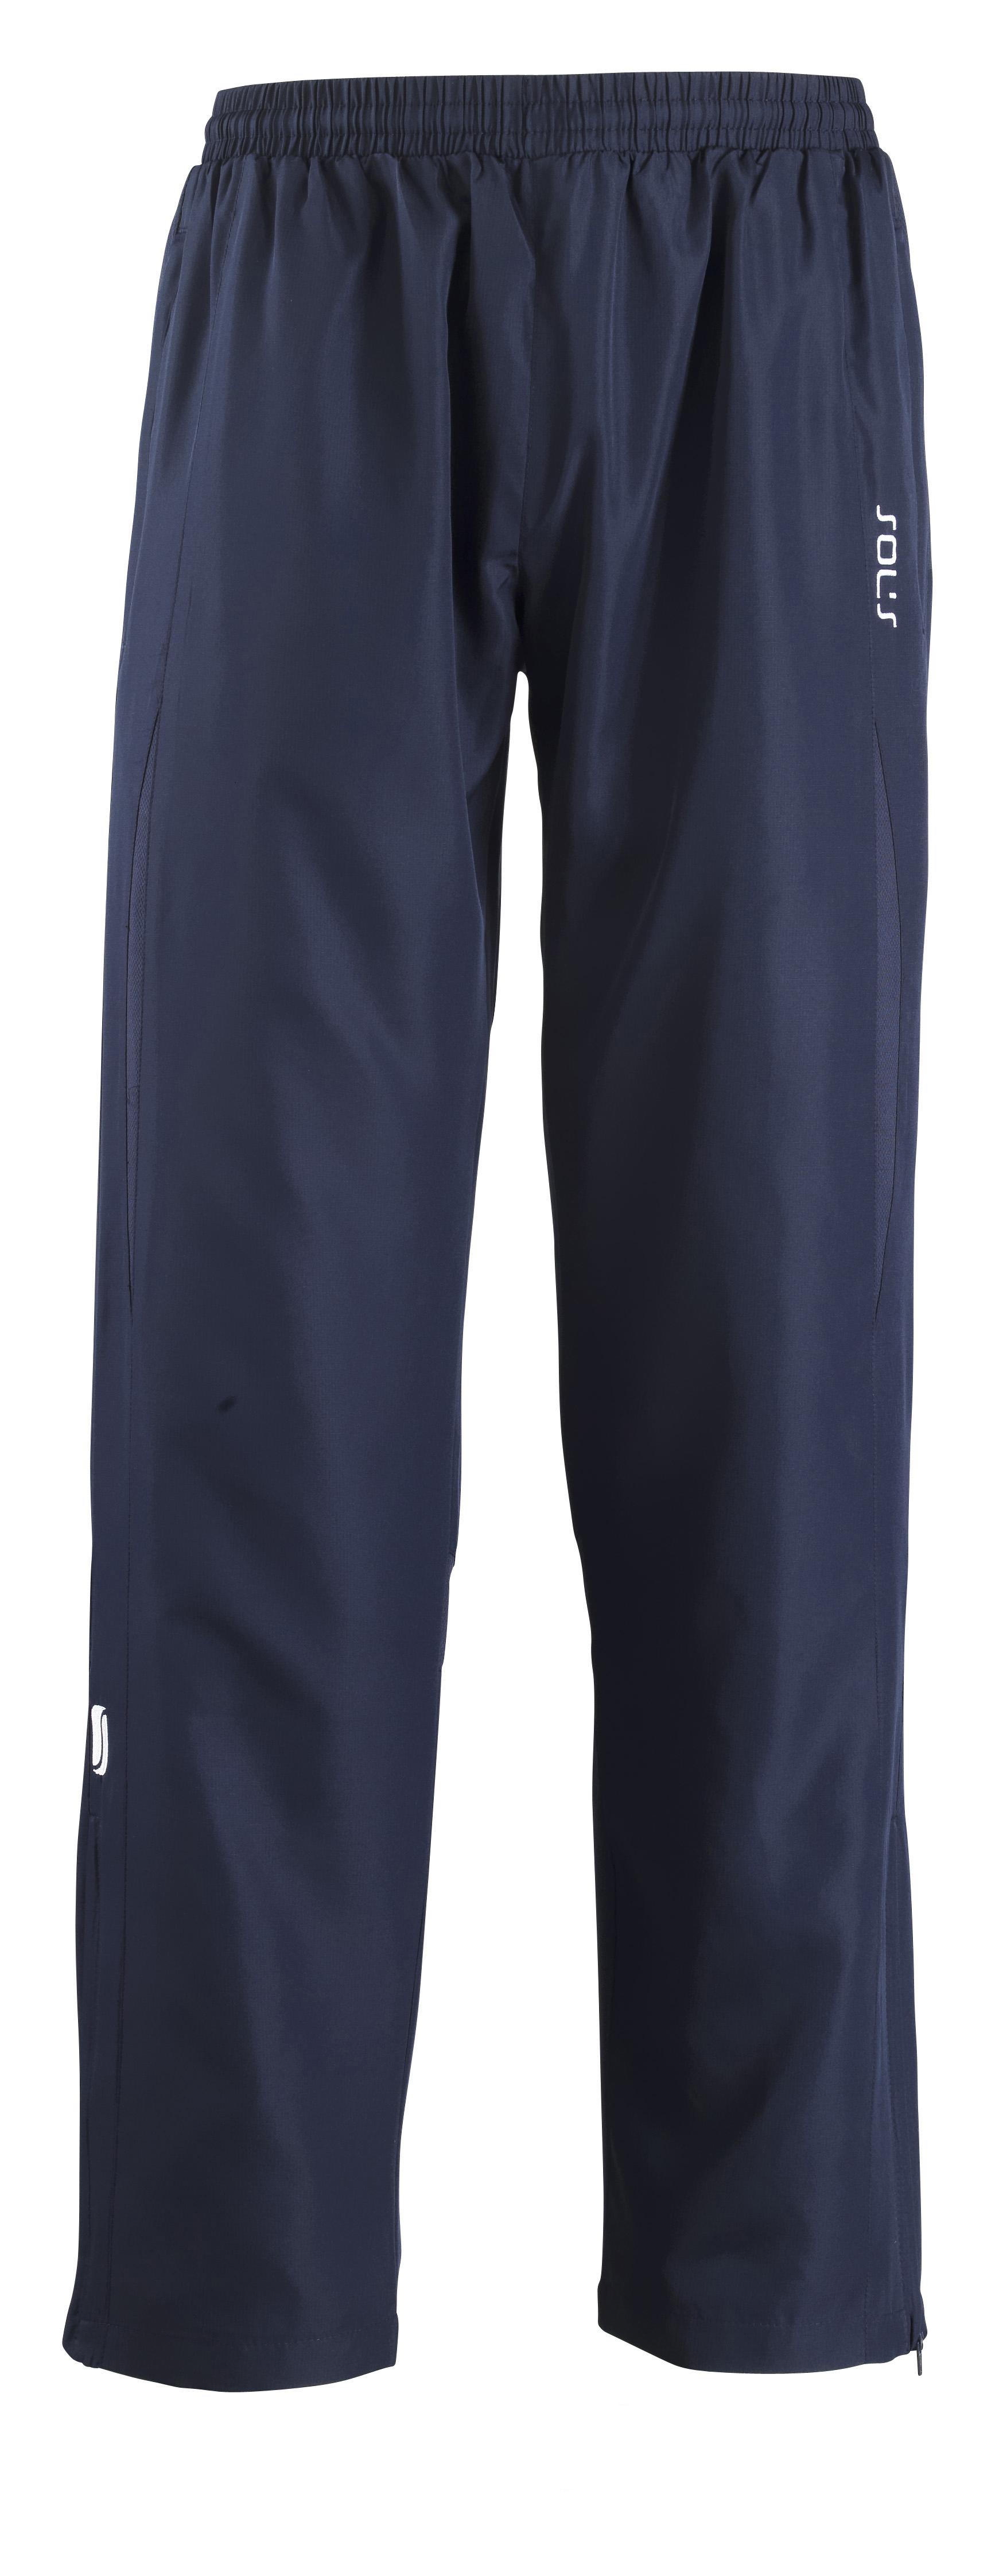 Old Trafford Pants - Navy - XXL